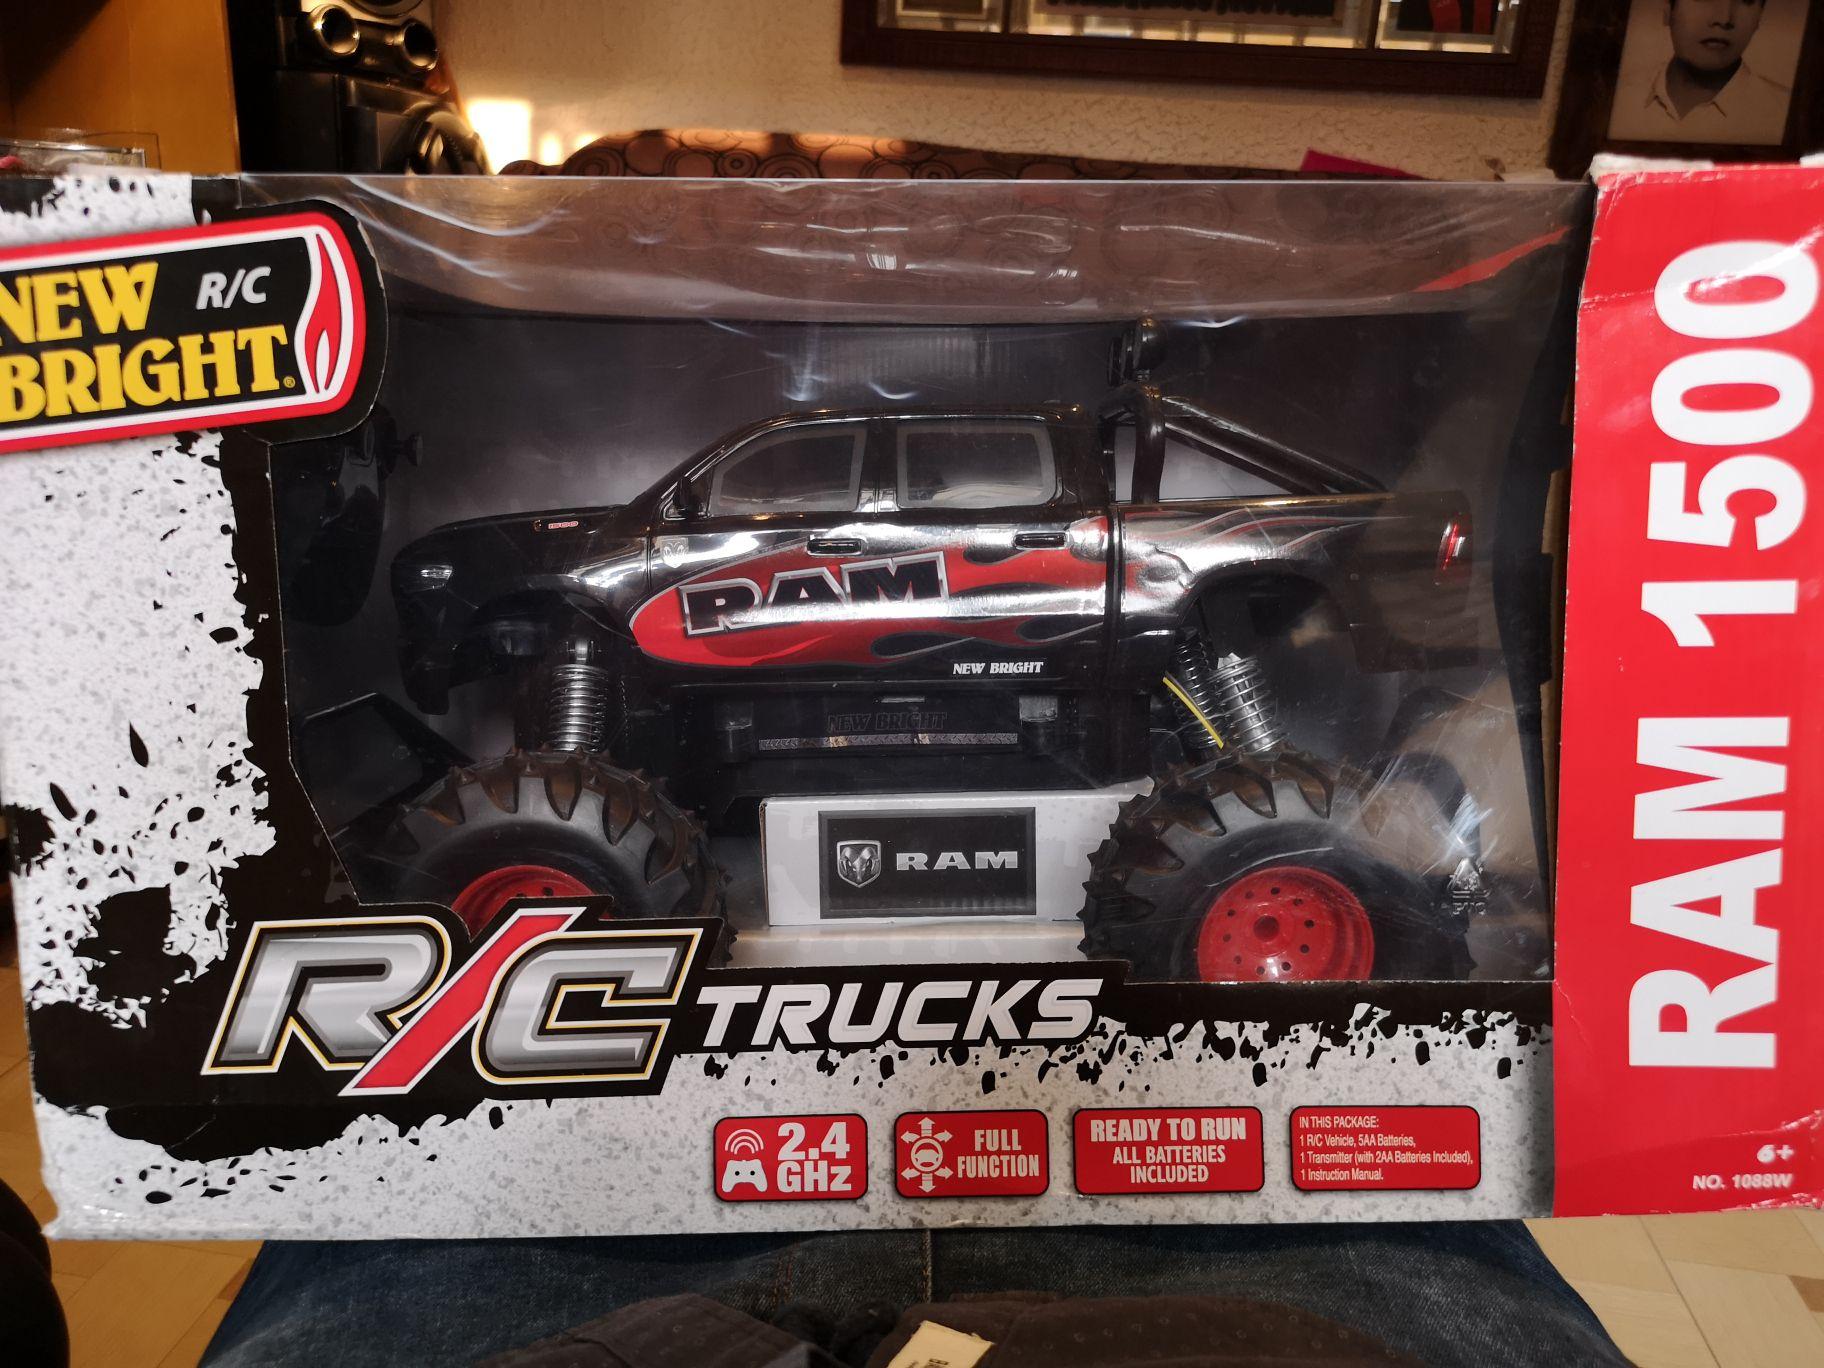 Bodega Aurrera: ram 1500 rc trucks 4x4